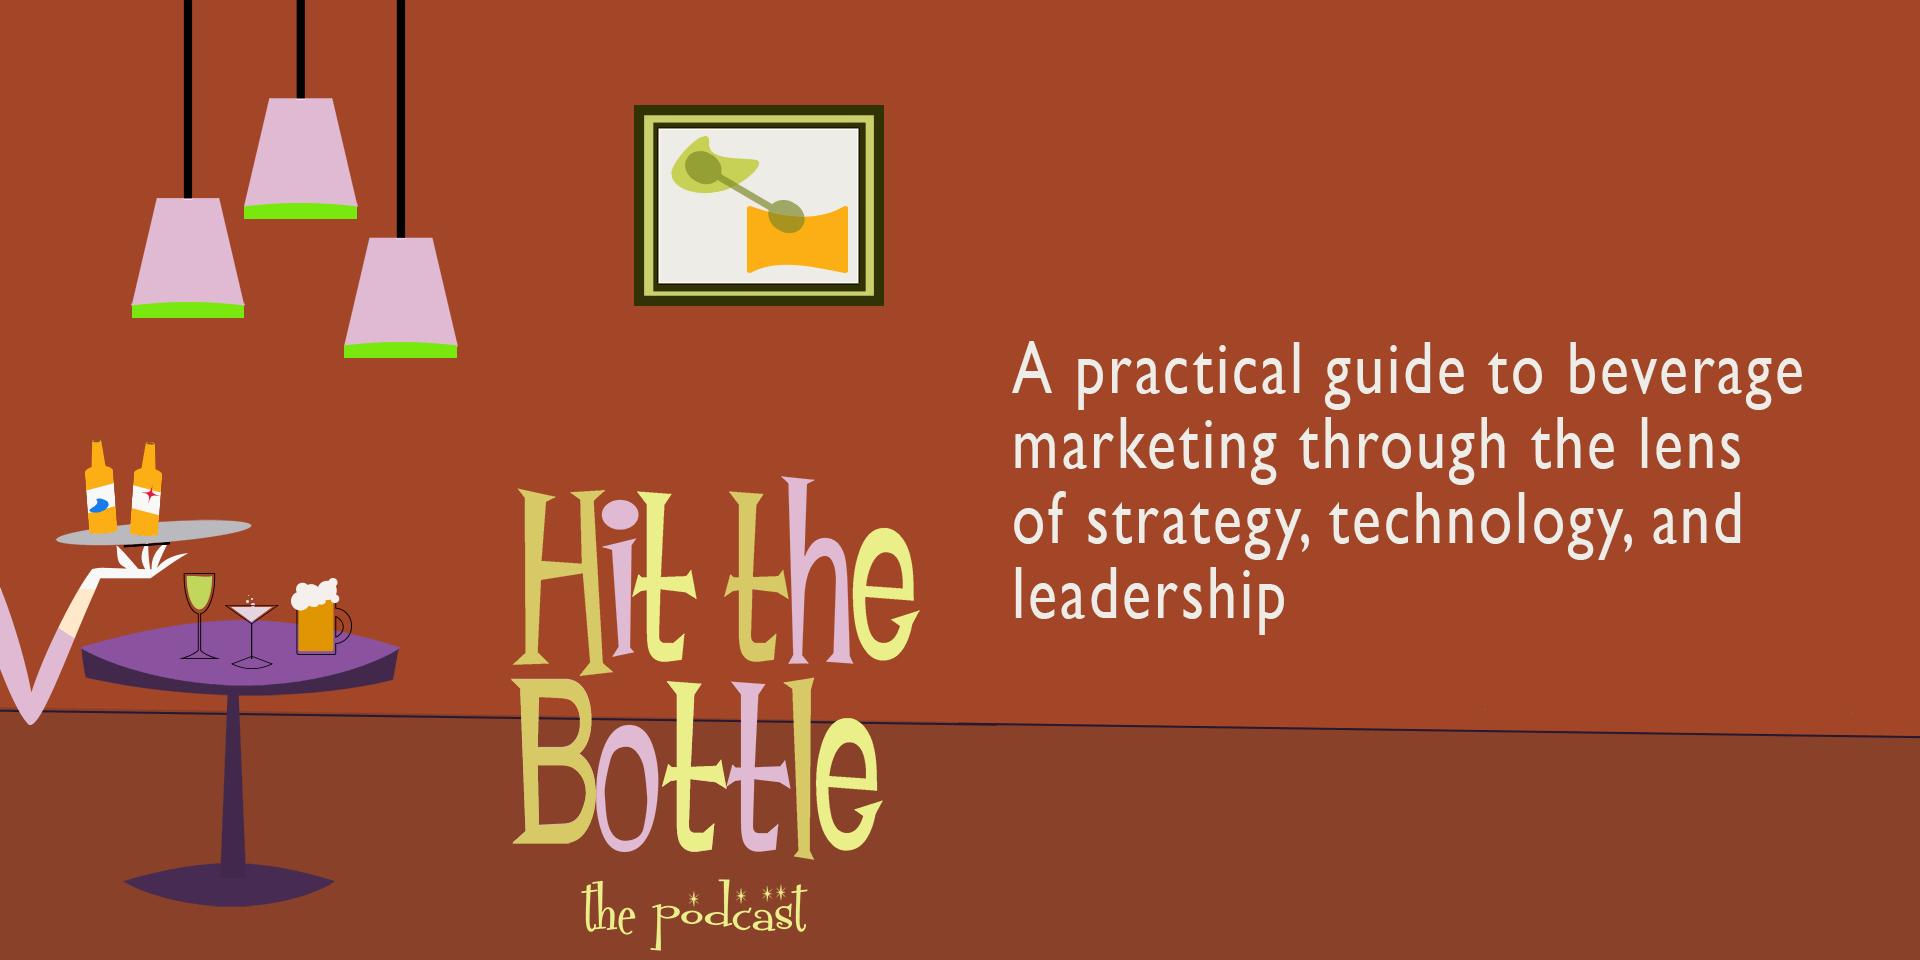 Hit the Bottle - Beverage Marketing Podcast